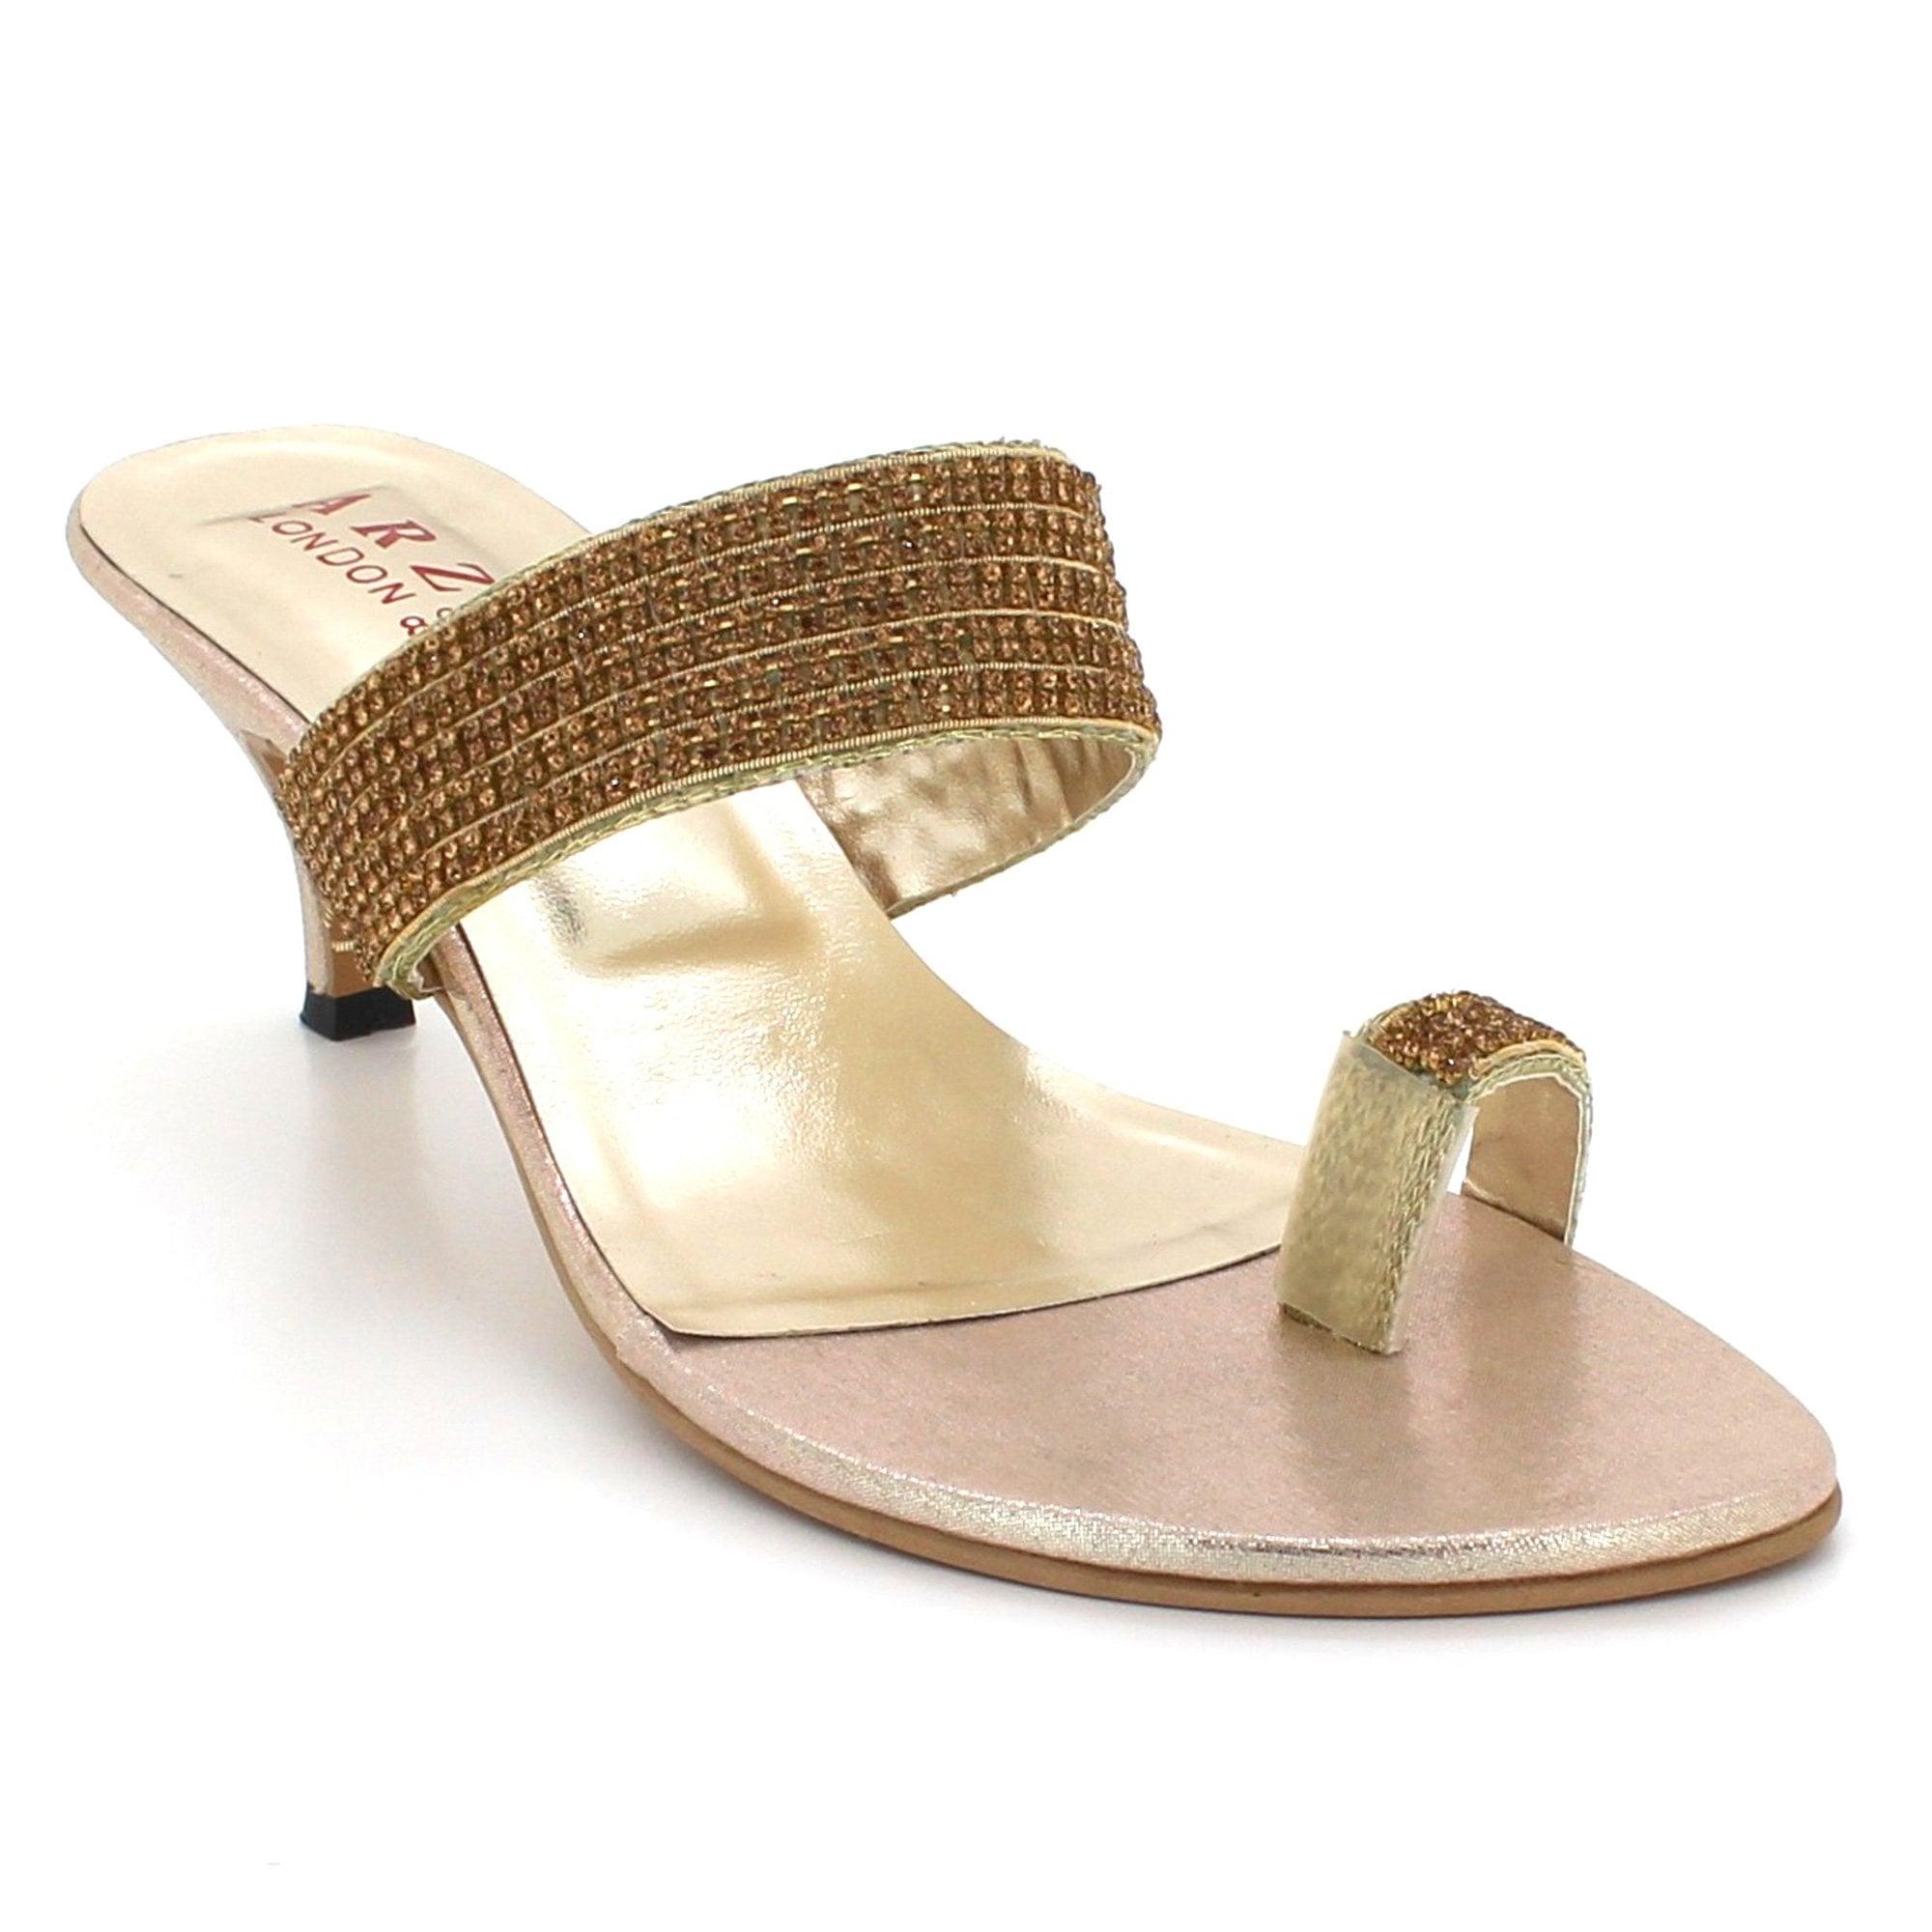 8ca9c384a00bb8 Aarz London Yasmin- Toe-Ring Low-Heel Footwear. Ladies Open Toe Diamante ...